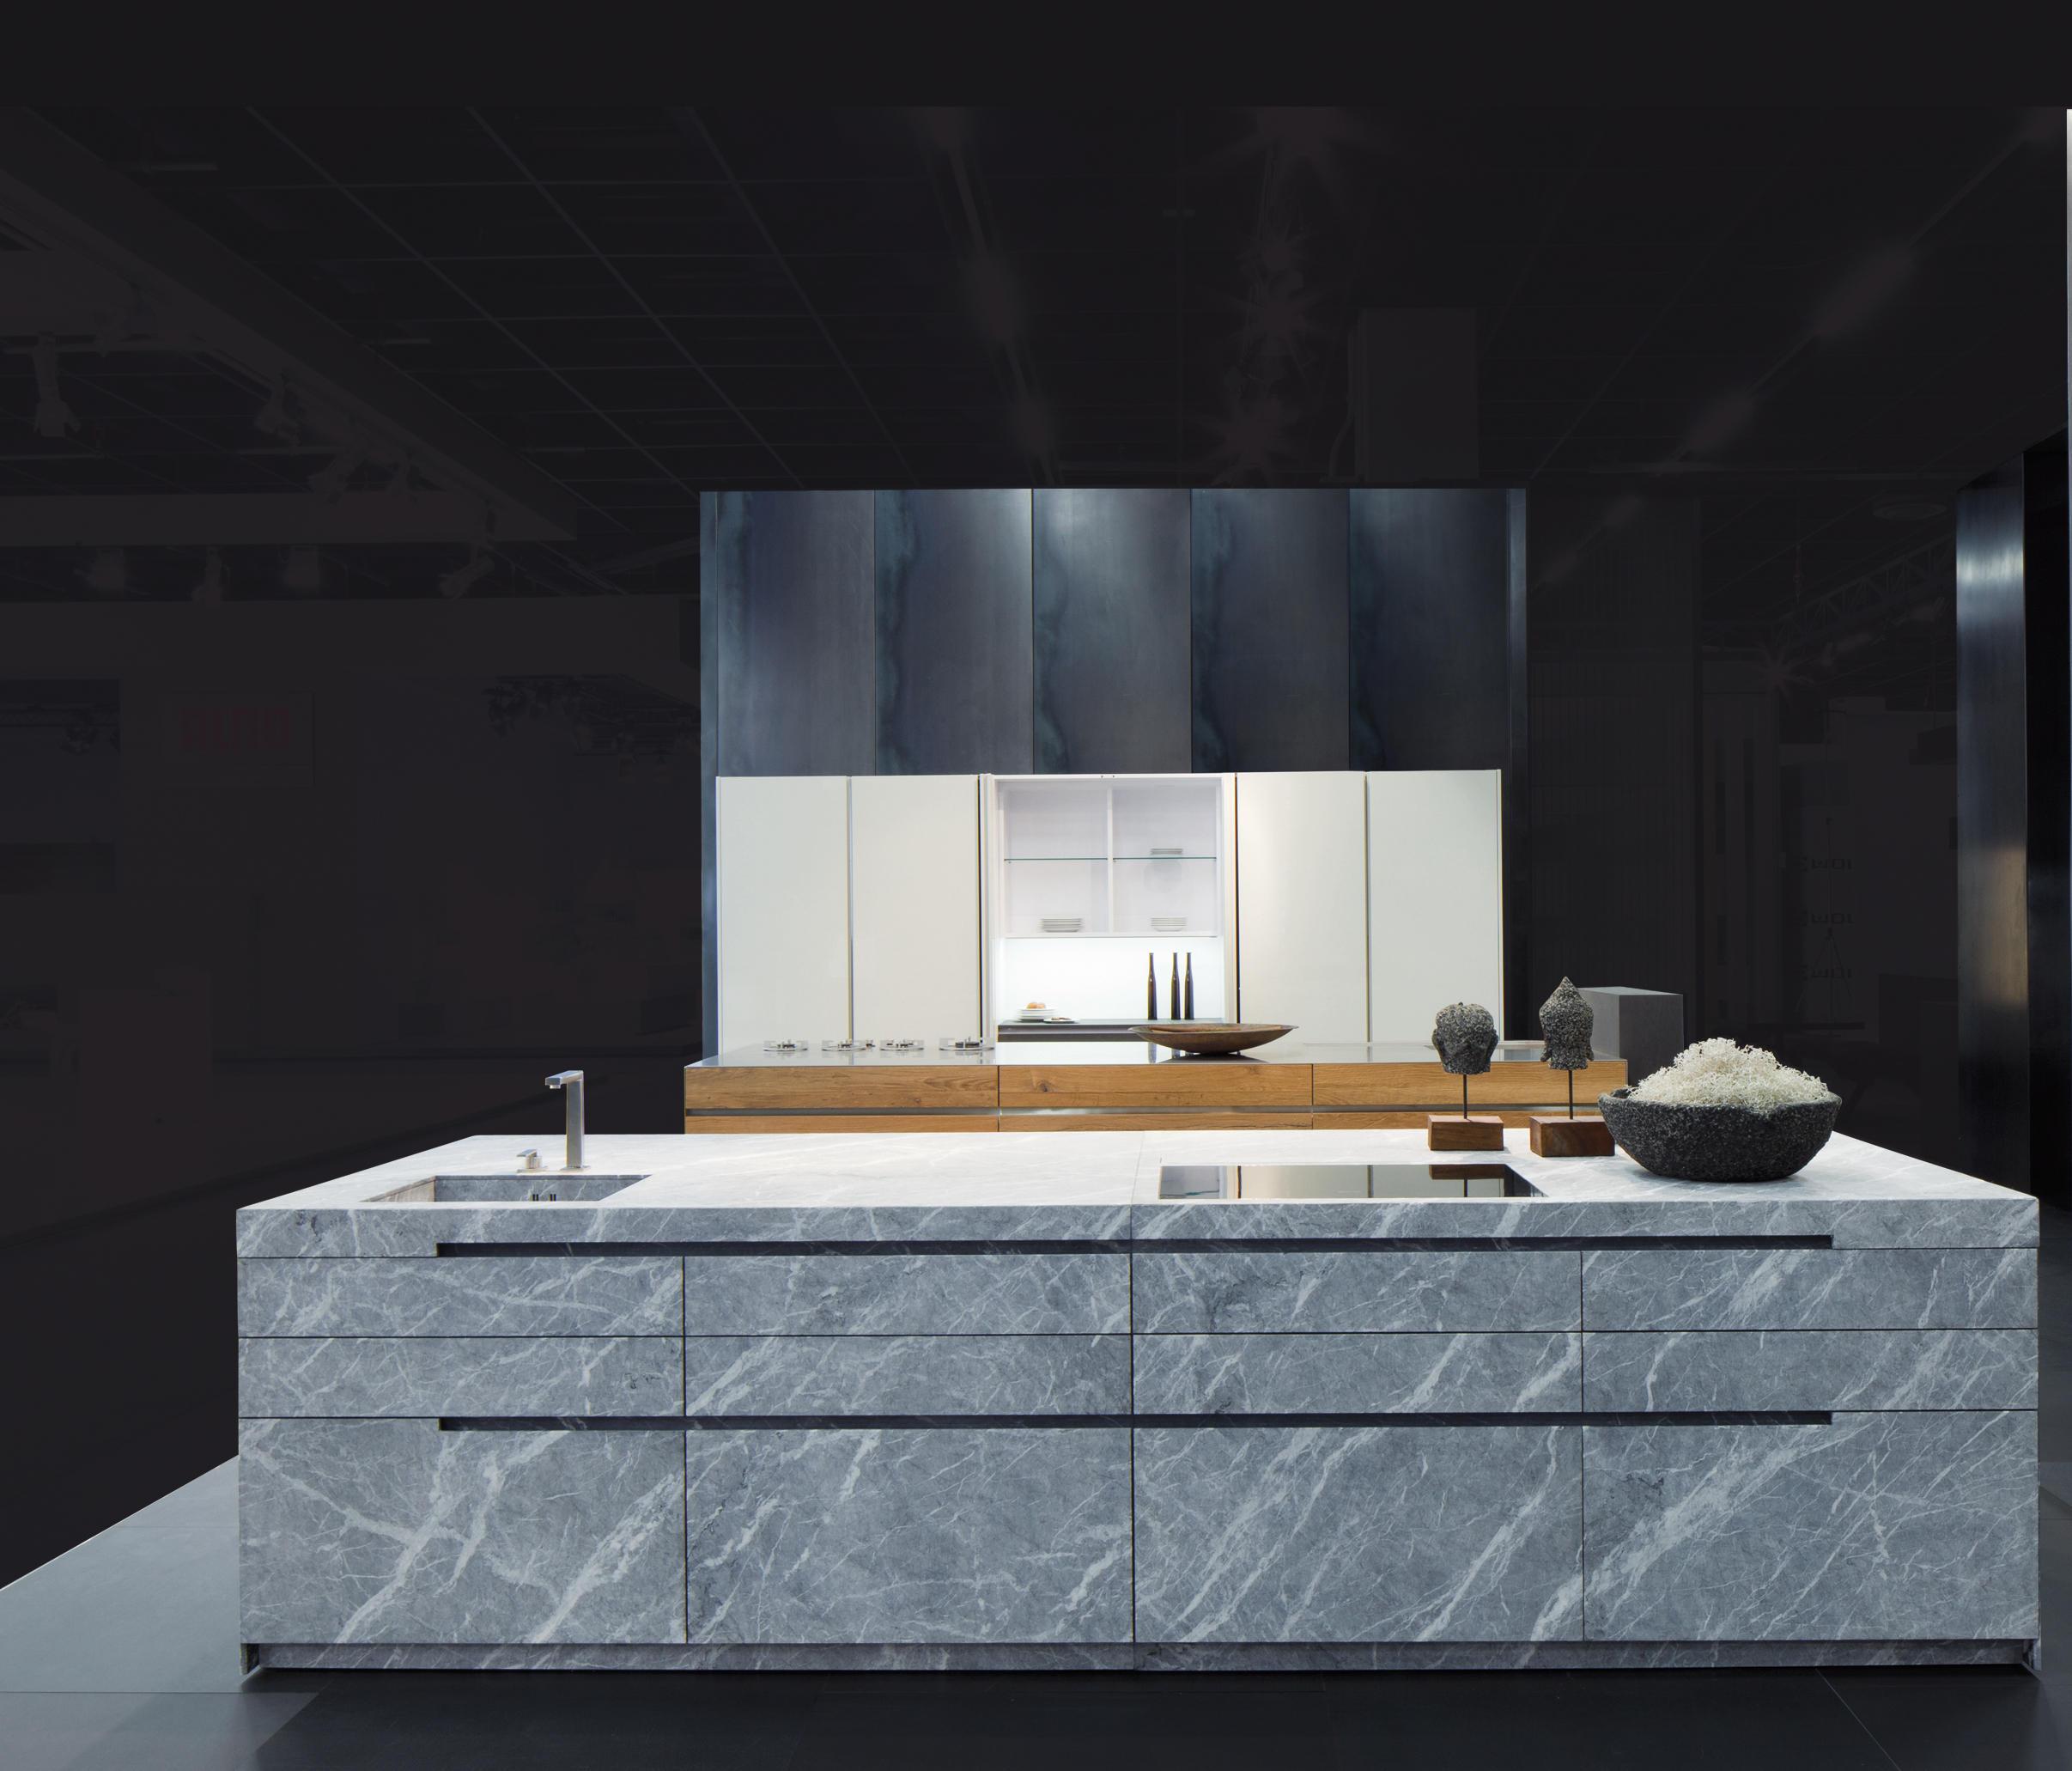 grigio carnico vintage island kitchens from eggersmann. Black Bedroom Furniture Sets. Home Design Ideas